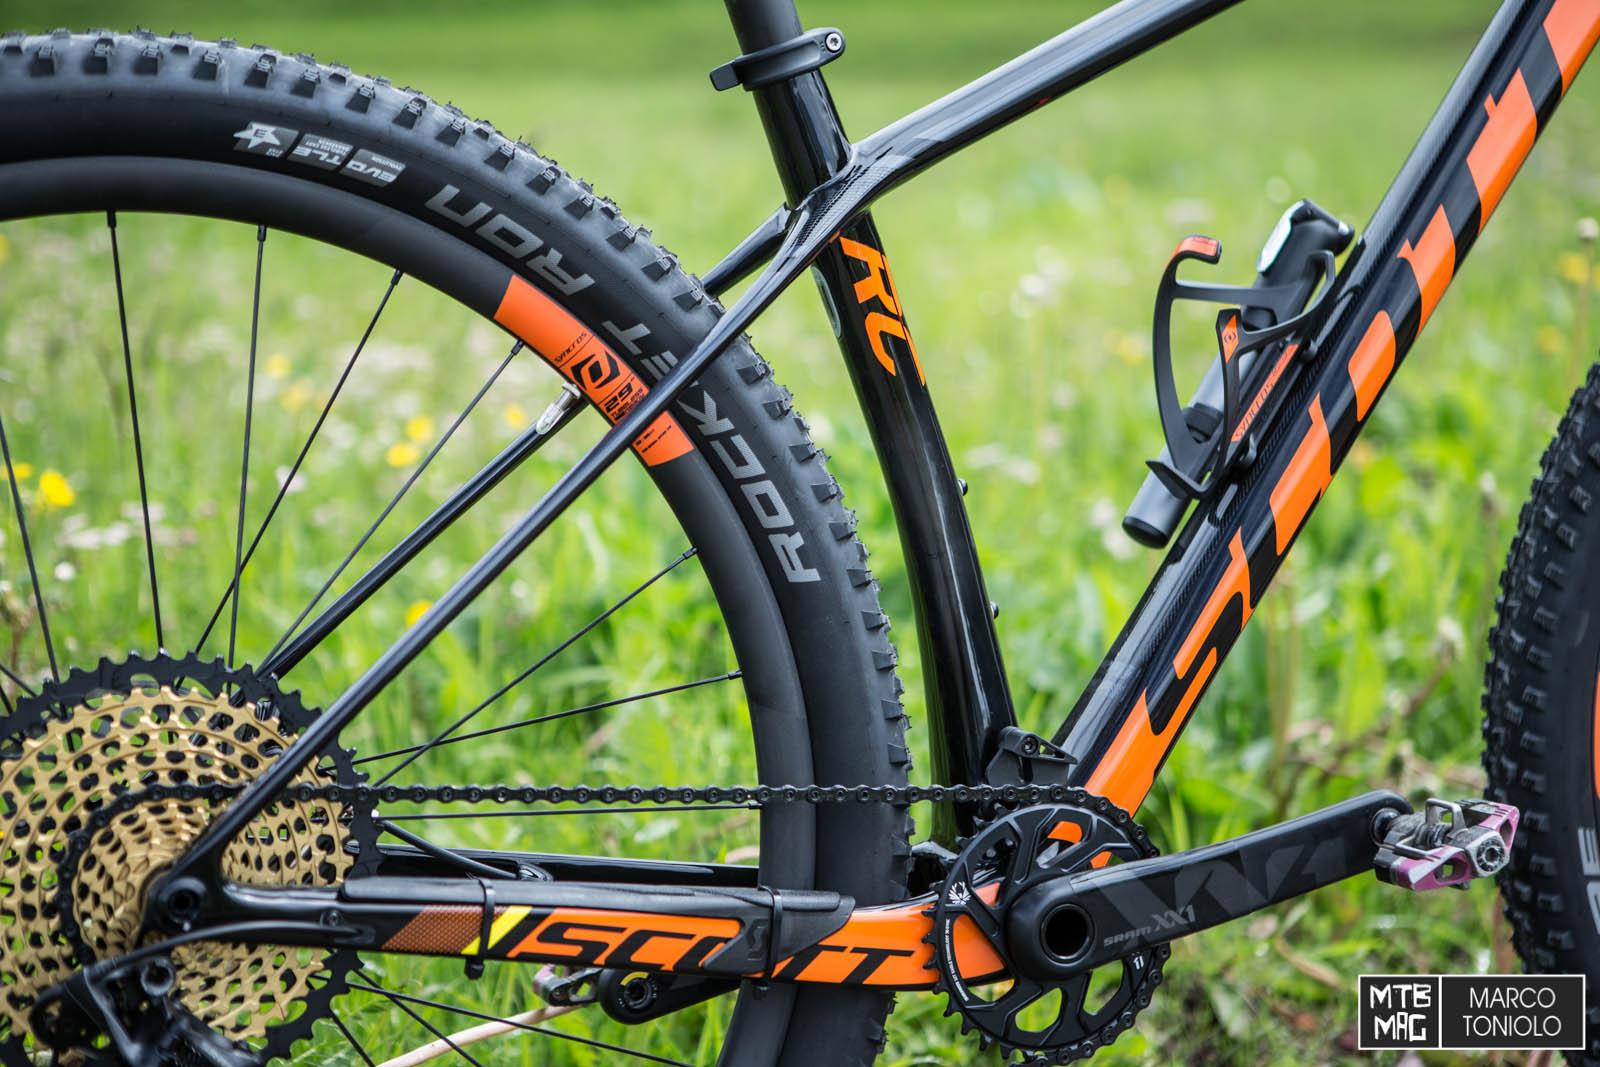 efa627c293c MTB-MAG.COM - Mountain Bike Magazine   Scott introduces the new ...